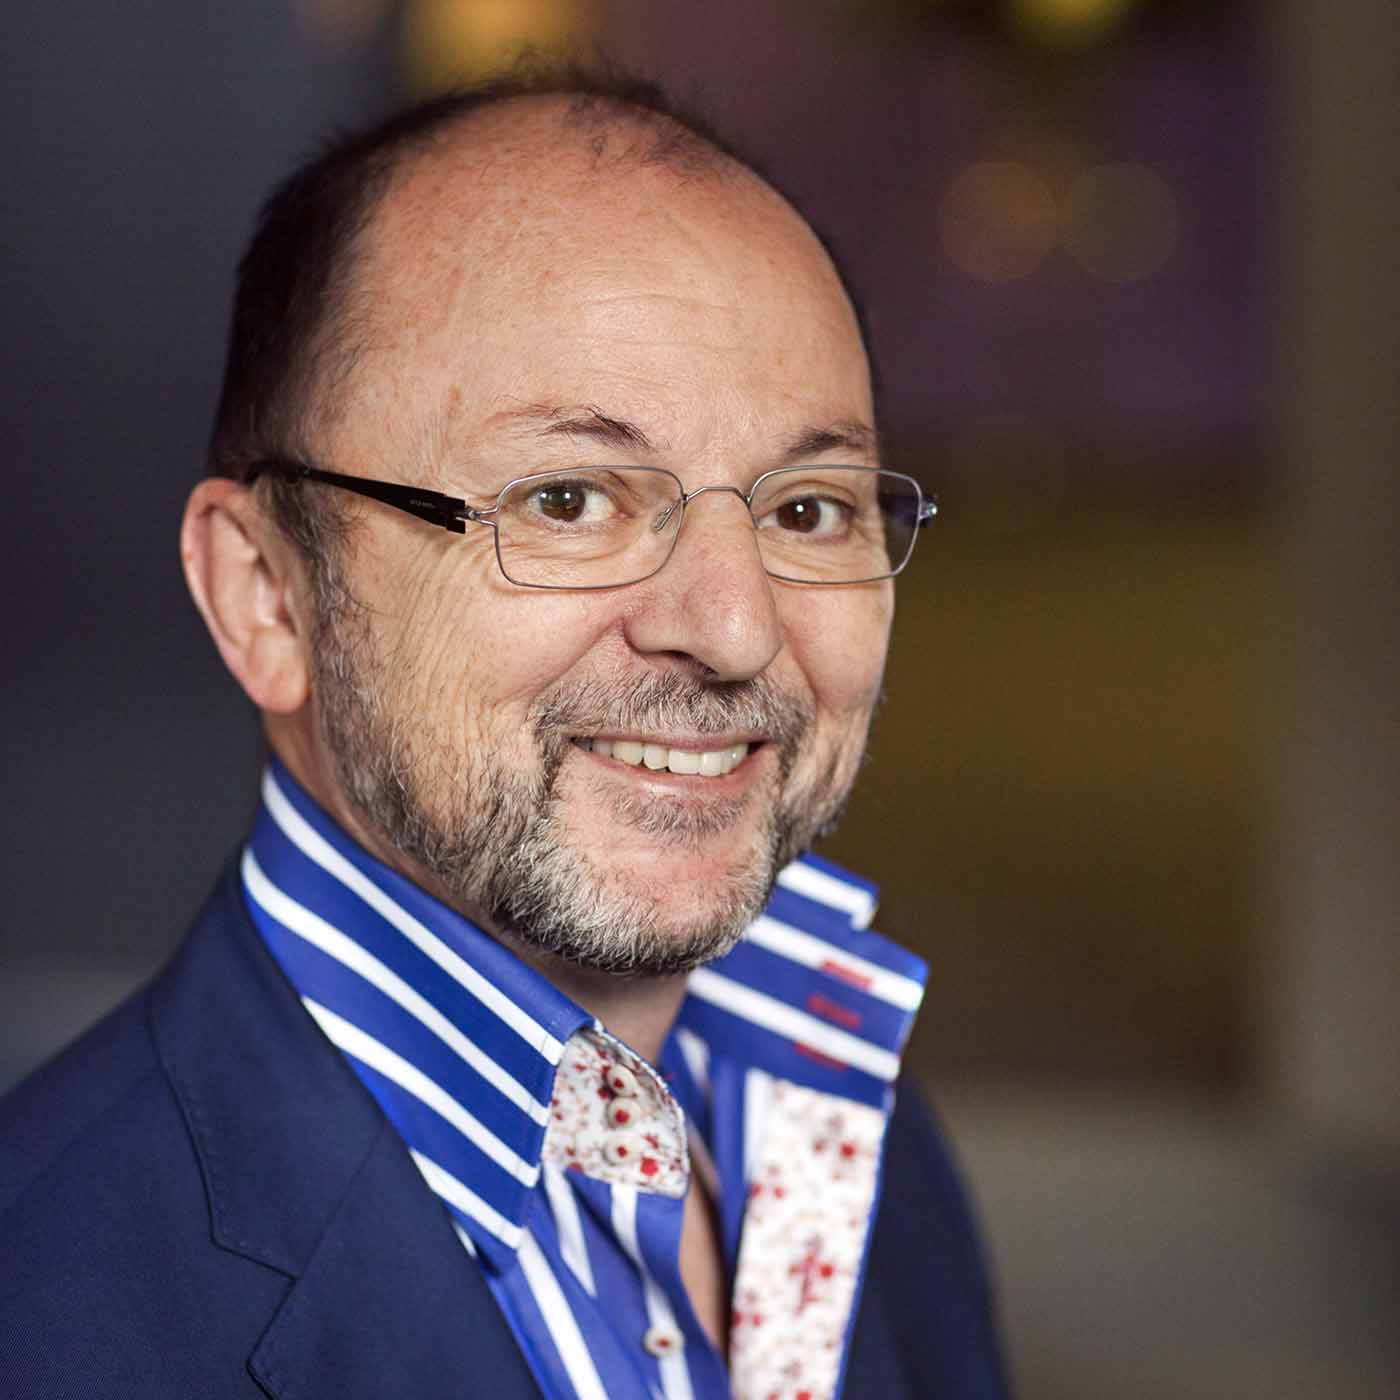 ambassadeur Paul Schnabel